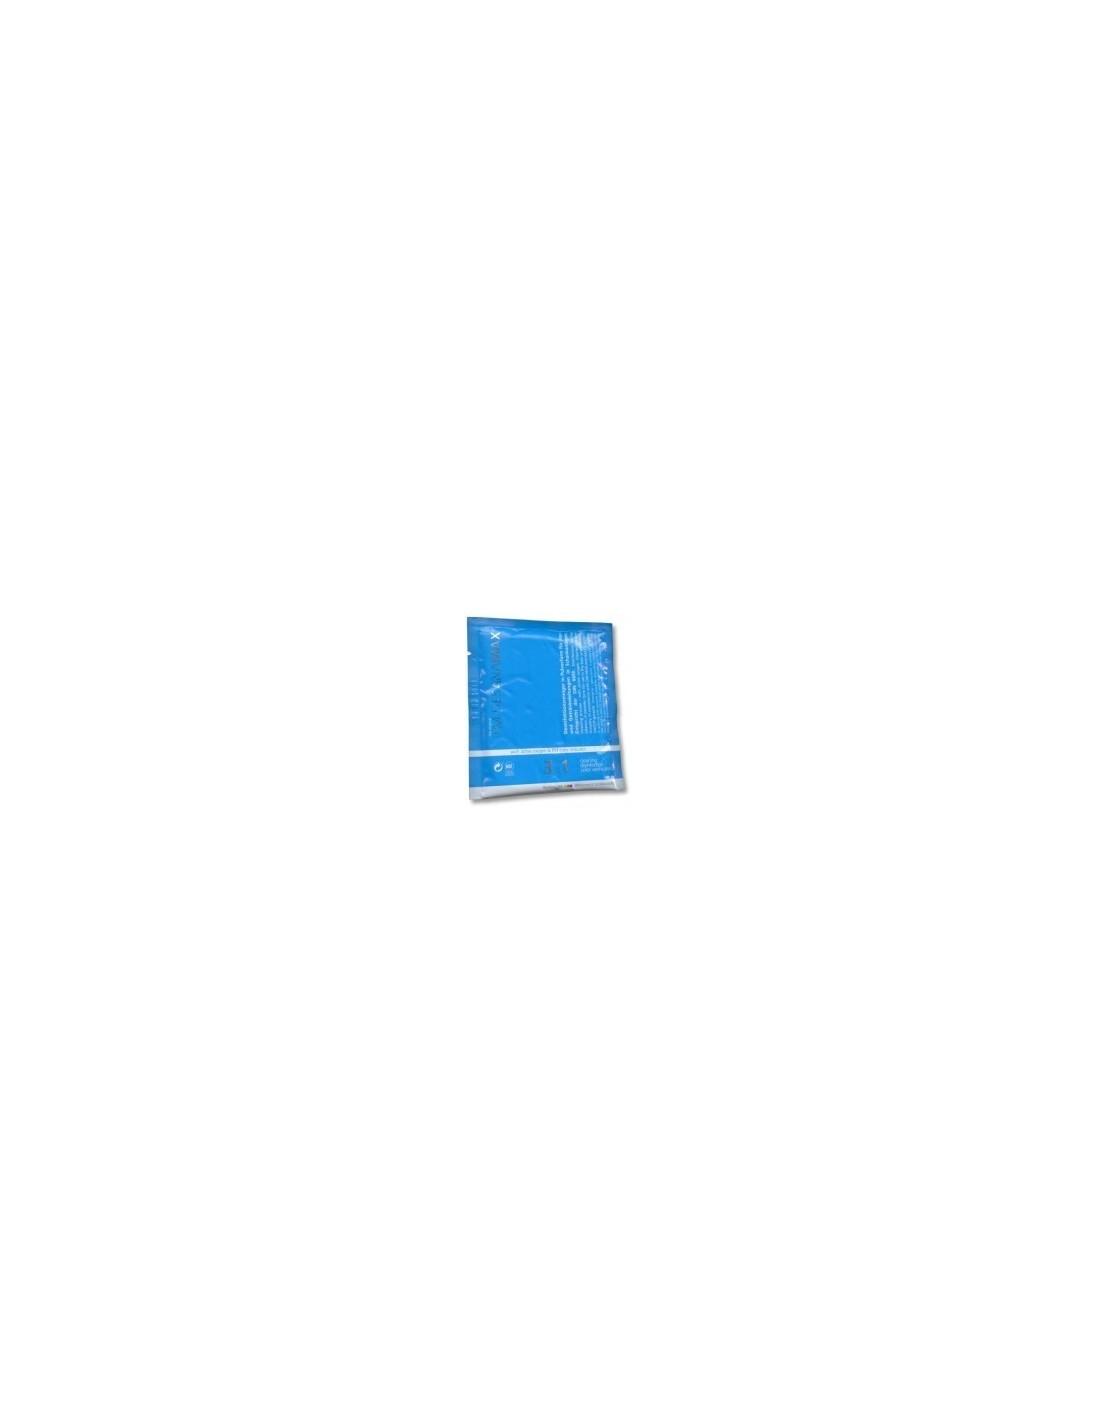 SAN01968 - Cleaning powder TM Desana Max